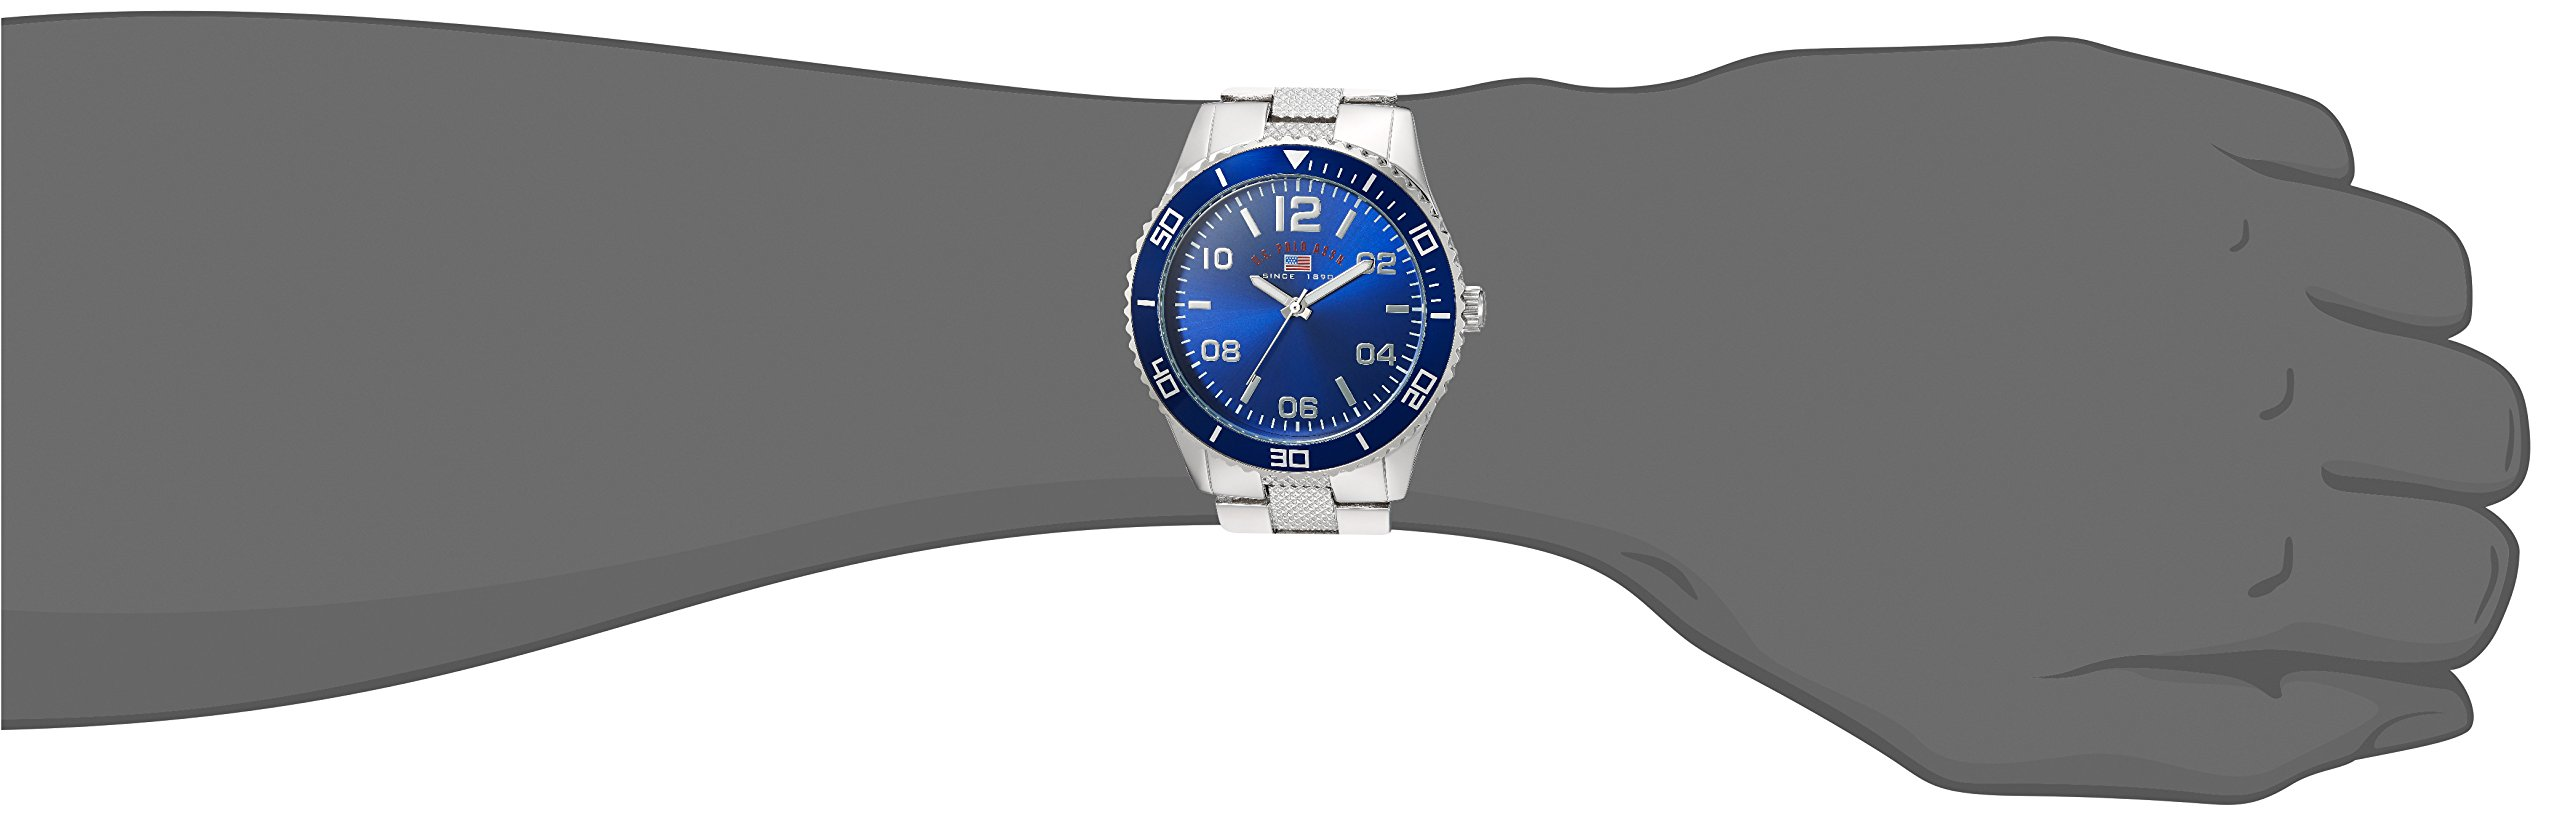 U.S. Polo Assn. Men's Quartz Metal and Alloy Casual Watch, Color:Silver-Toned (Model: US8609)